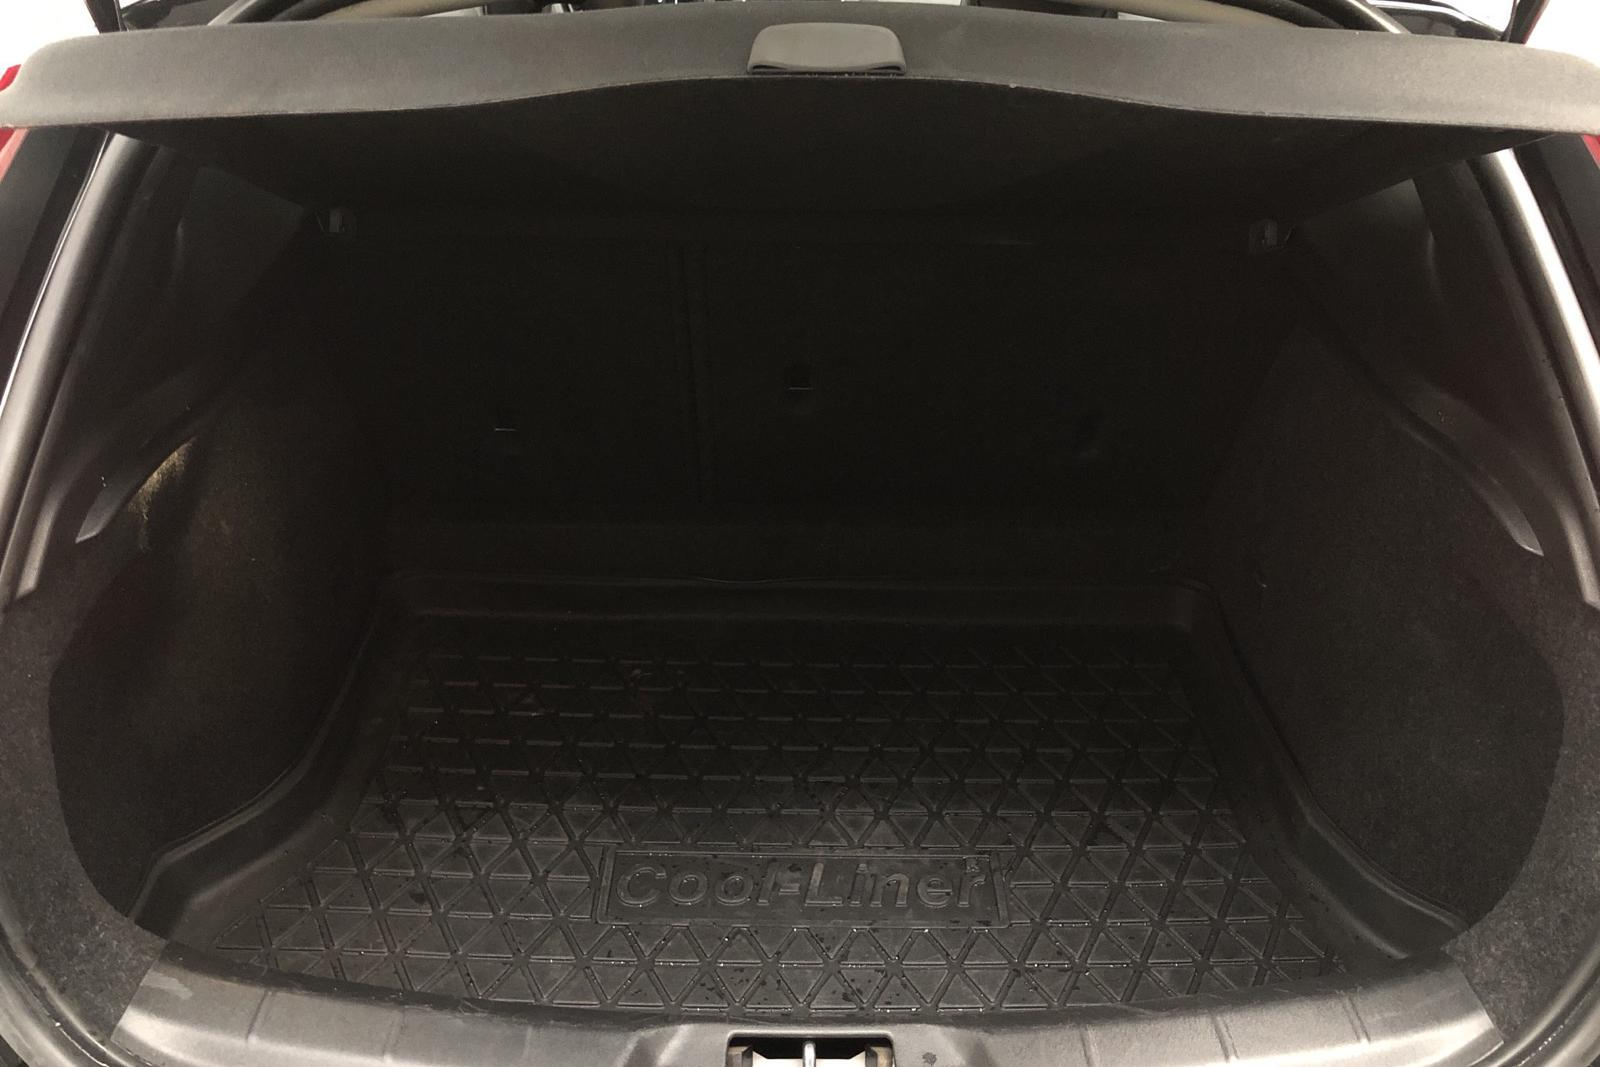 Volvo V40 Cross Country T3 (152hk) - 52 000 km - Automatic - black - 2016